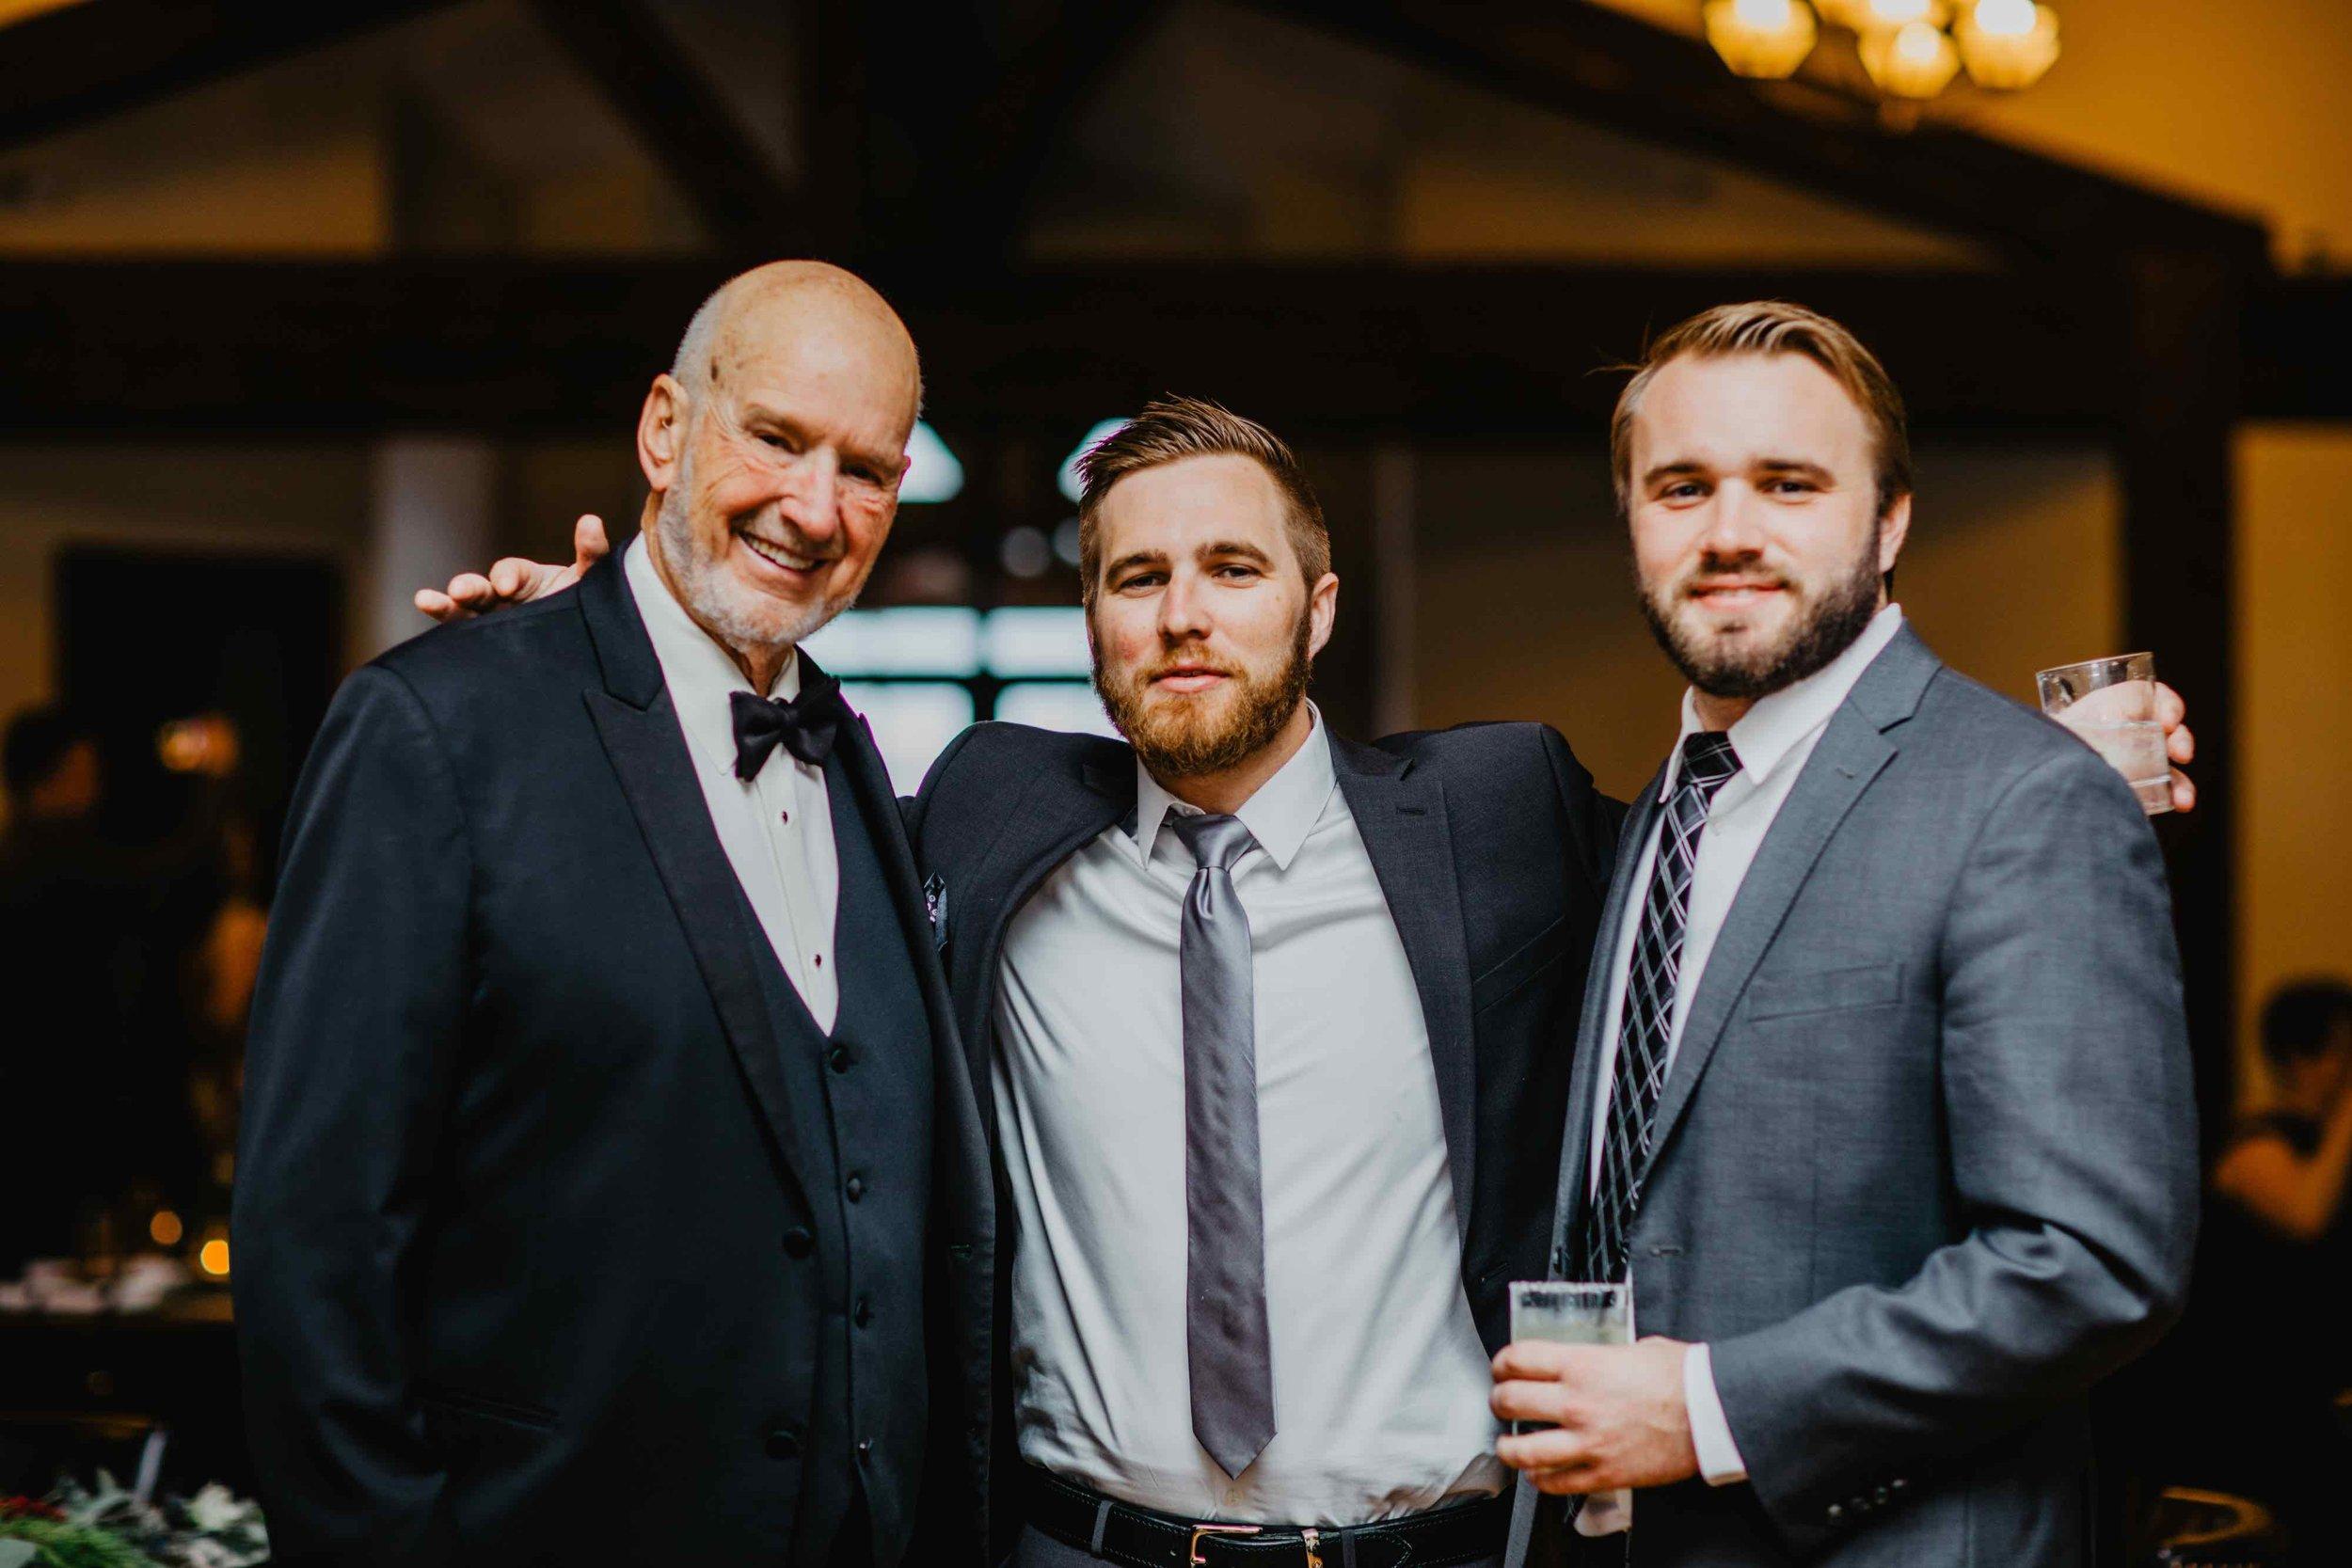 Kisa Conrad Favorites-0049-colorado-wedding-photographer-denver-springs-vailhotel-glenwood-springs-colorado-wedding-photographer.jpeg